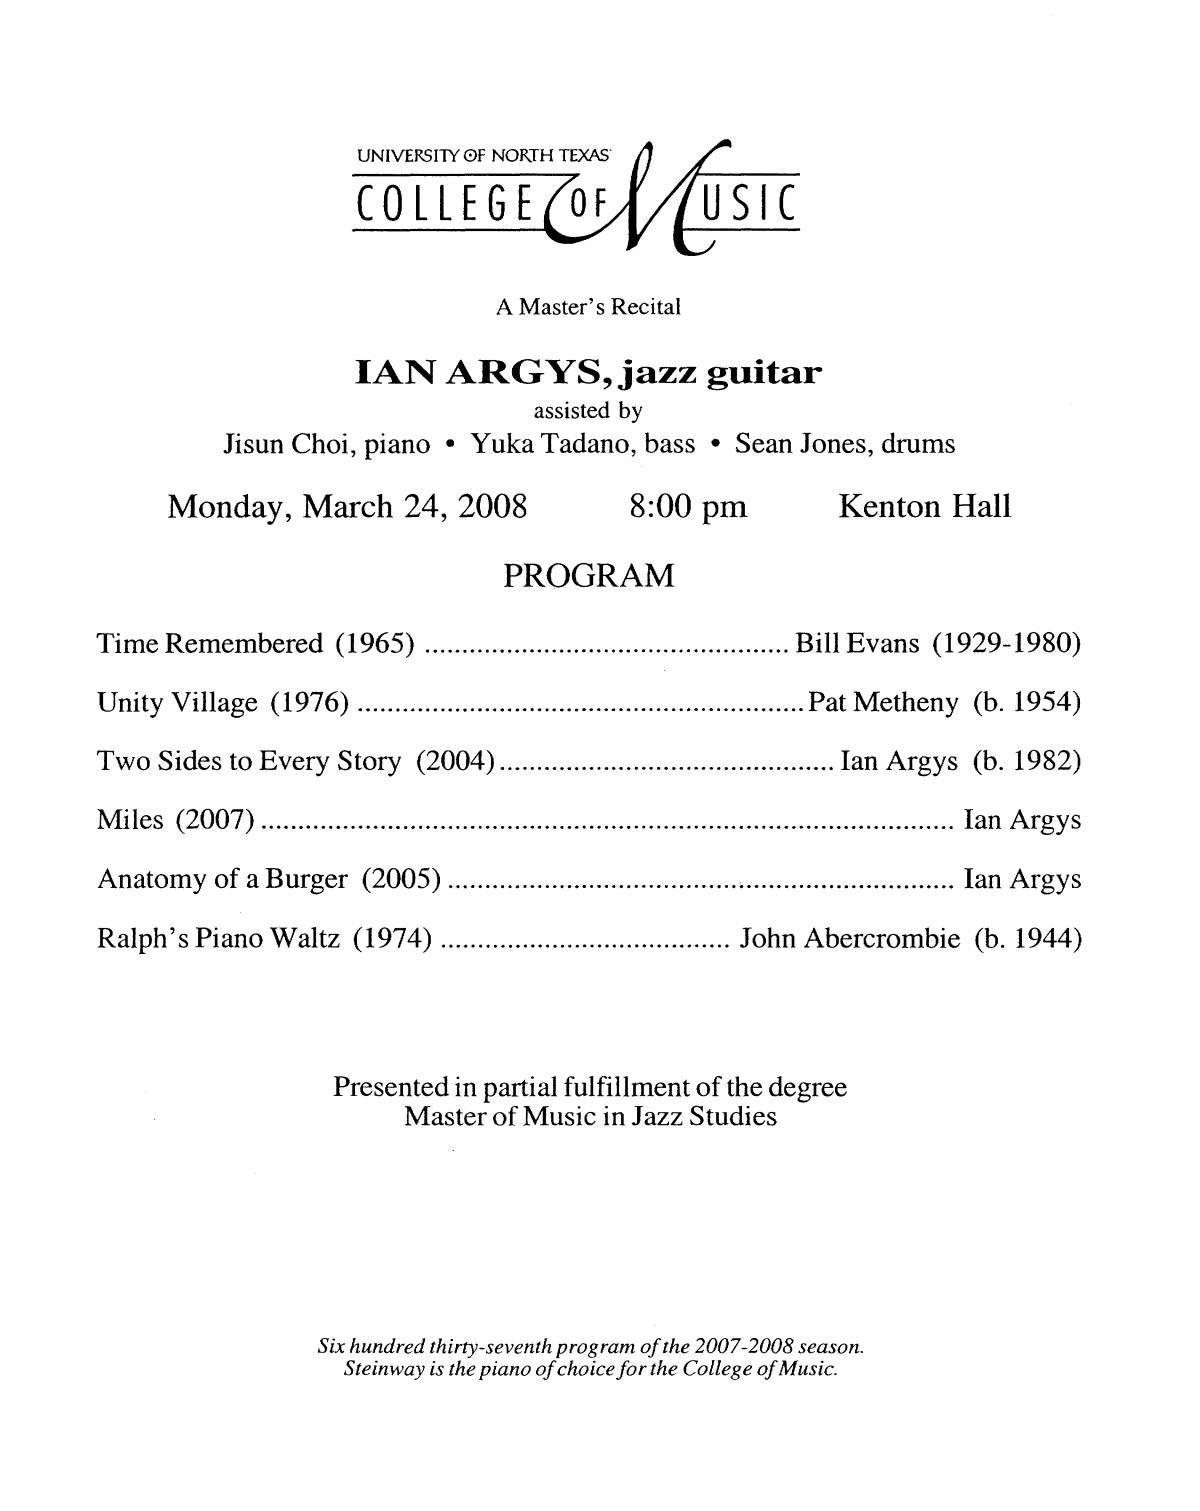 College of Music program book 2007-2008 Student Performances Vol. 2 ...